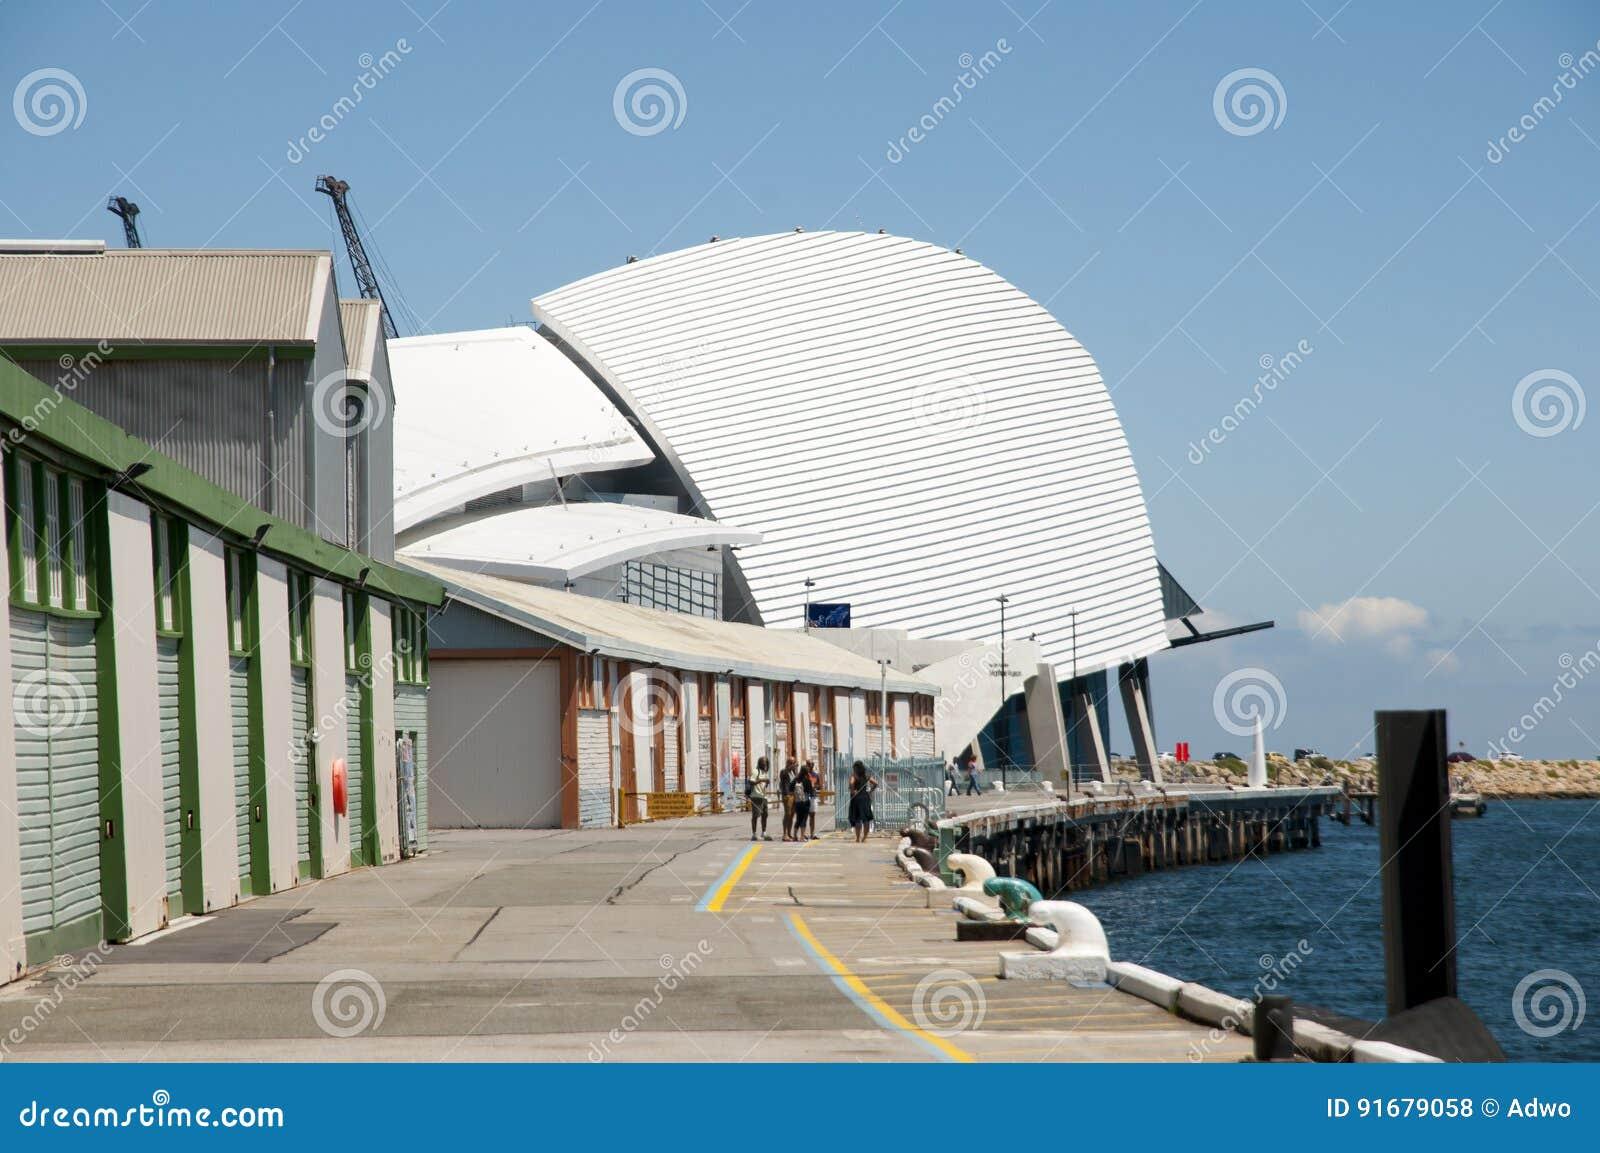 Västra australiskt maritimt museum - Fremantle - Australien